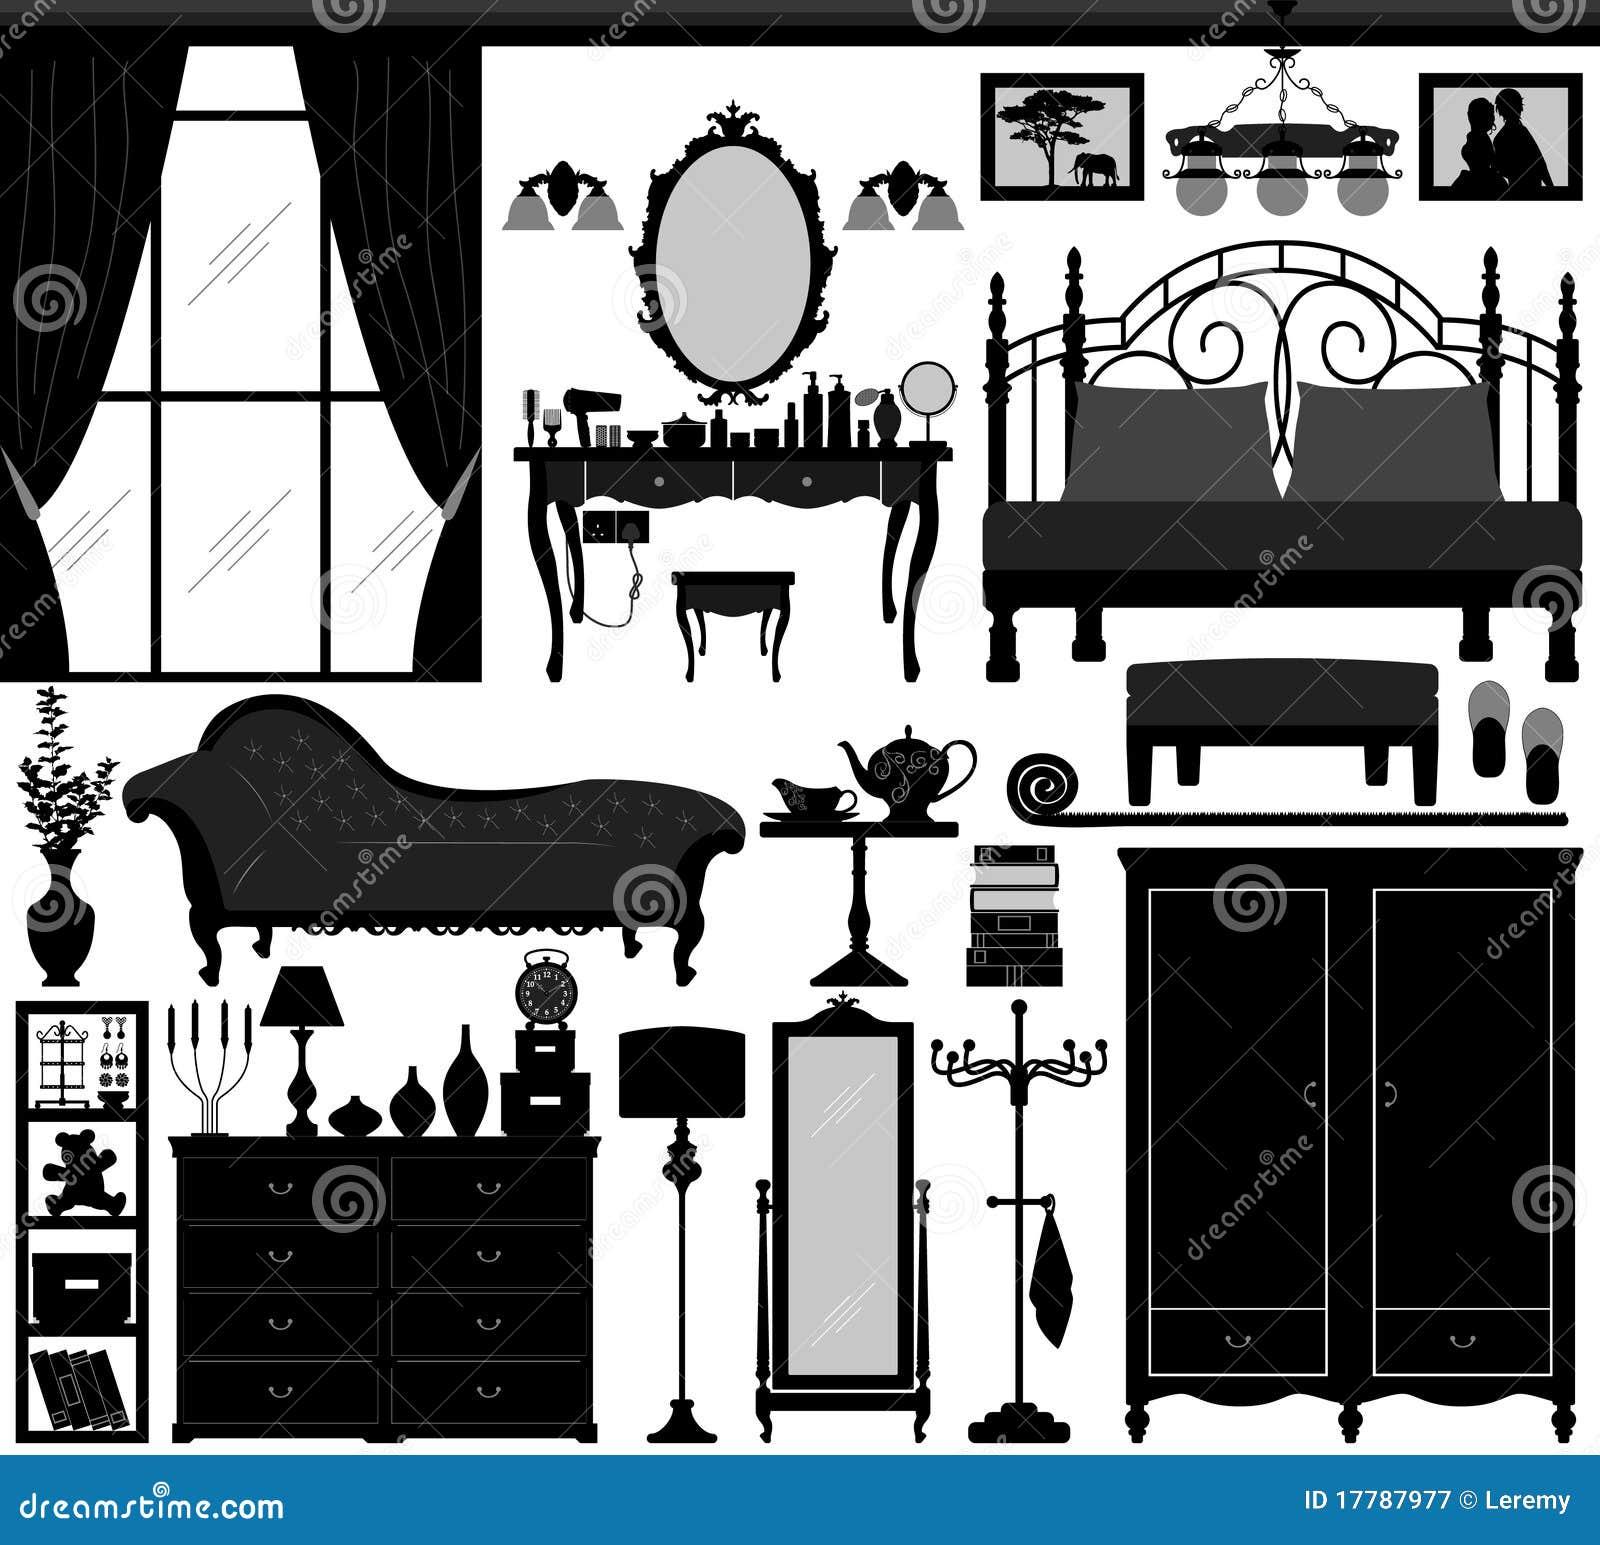 Interior Design Services Clip Art